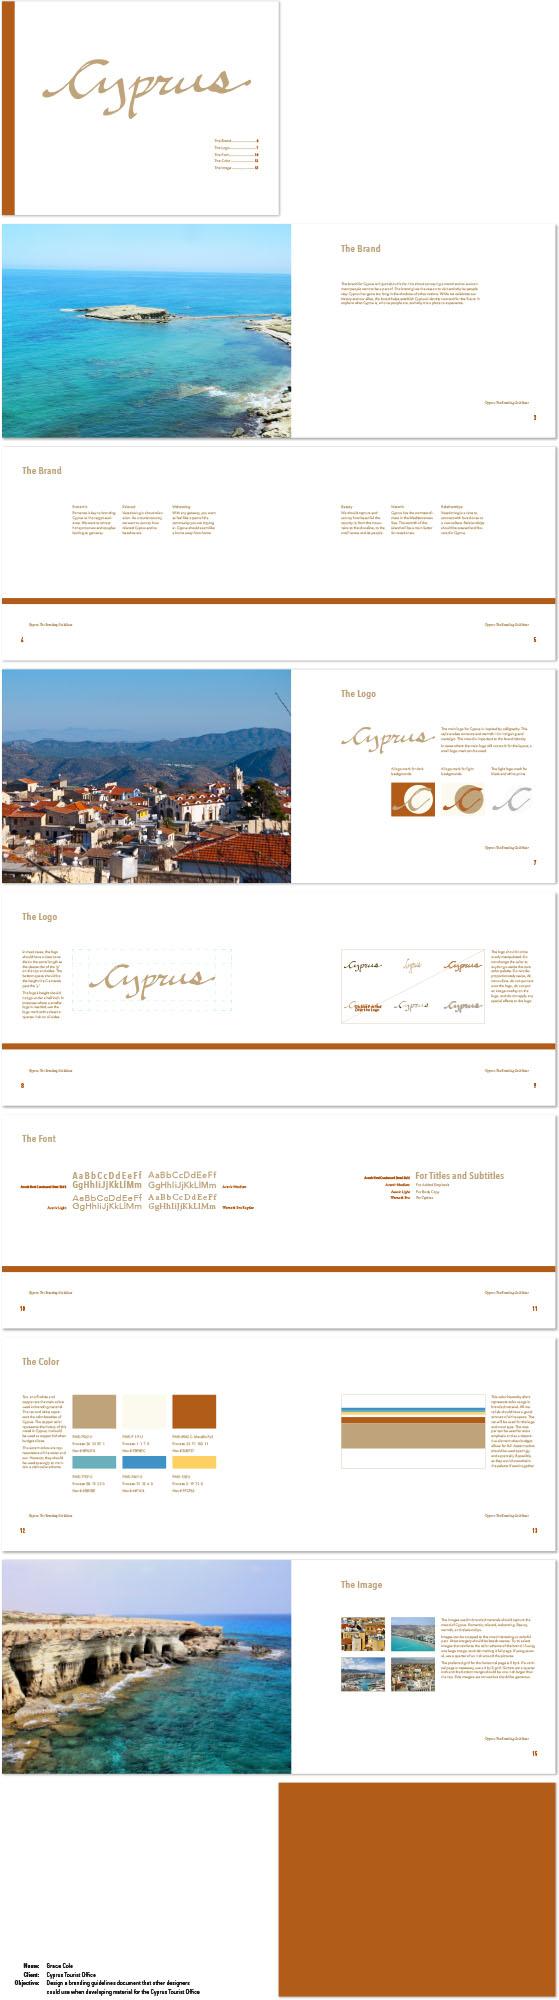 Branding Book Design